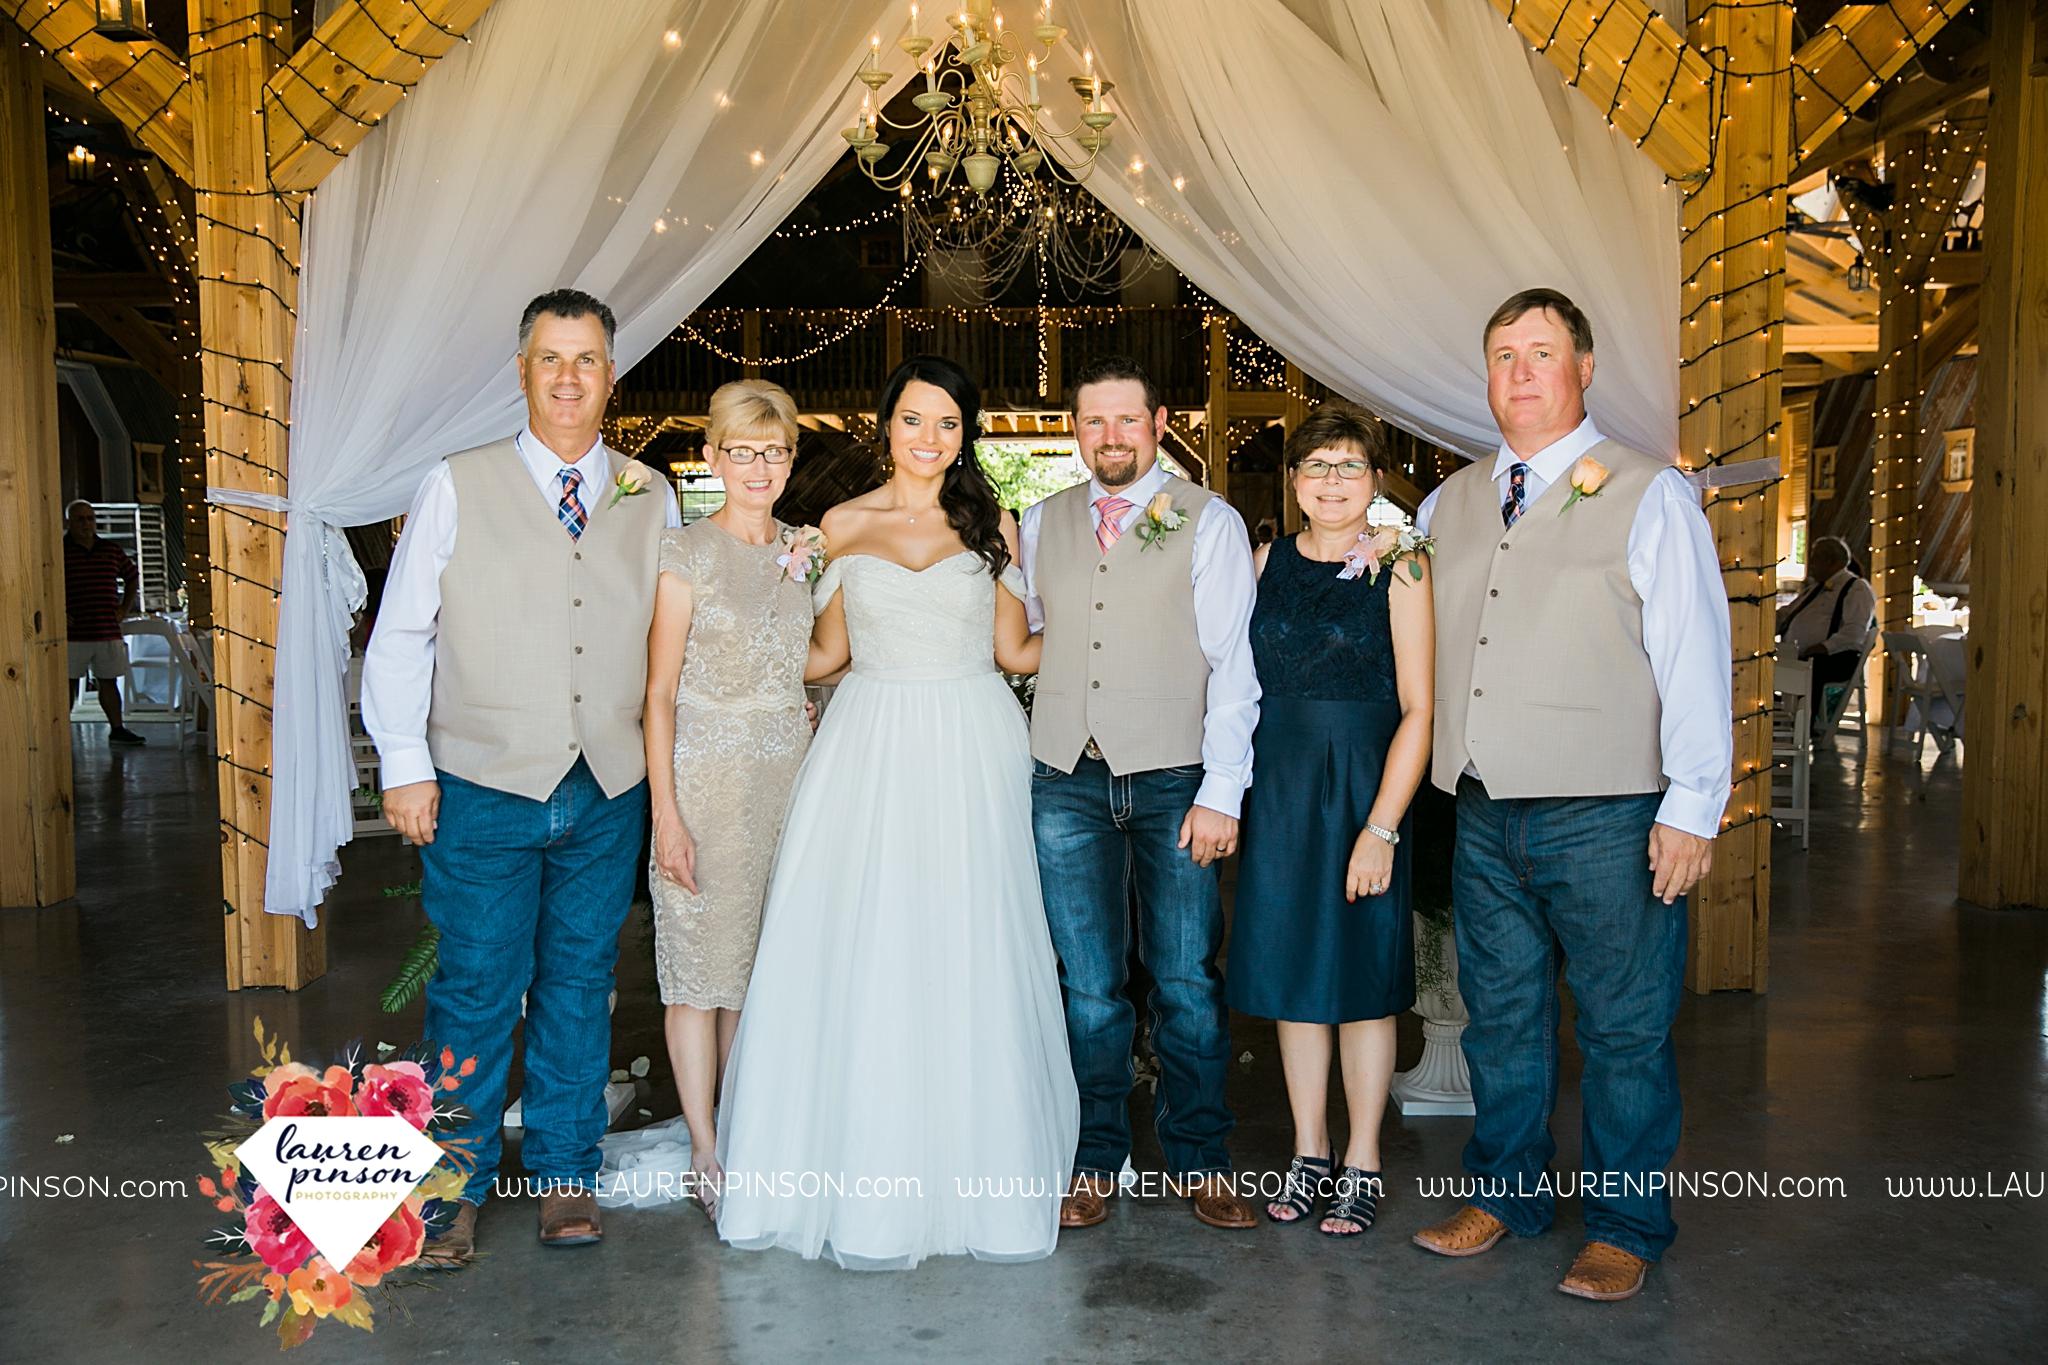 jones-barn-willow-creek-ranch-wedding-in-cleburne-texas-fort-worth-dfw-wichita-falls-wedding-photography_3230.jpg